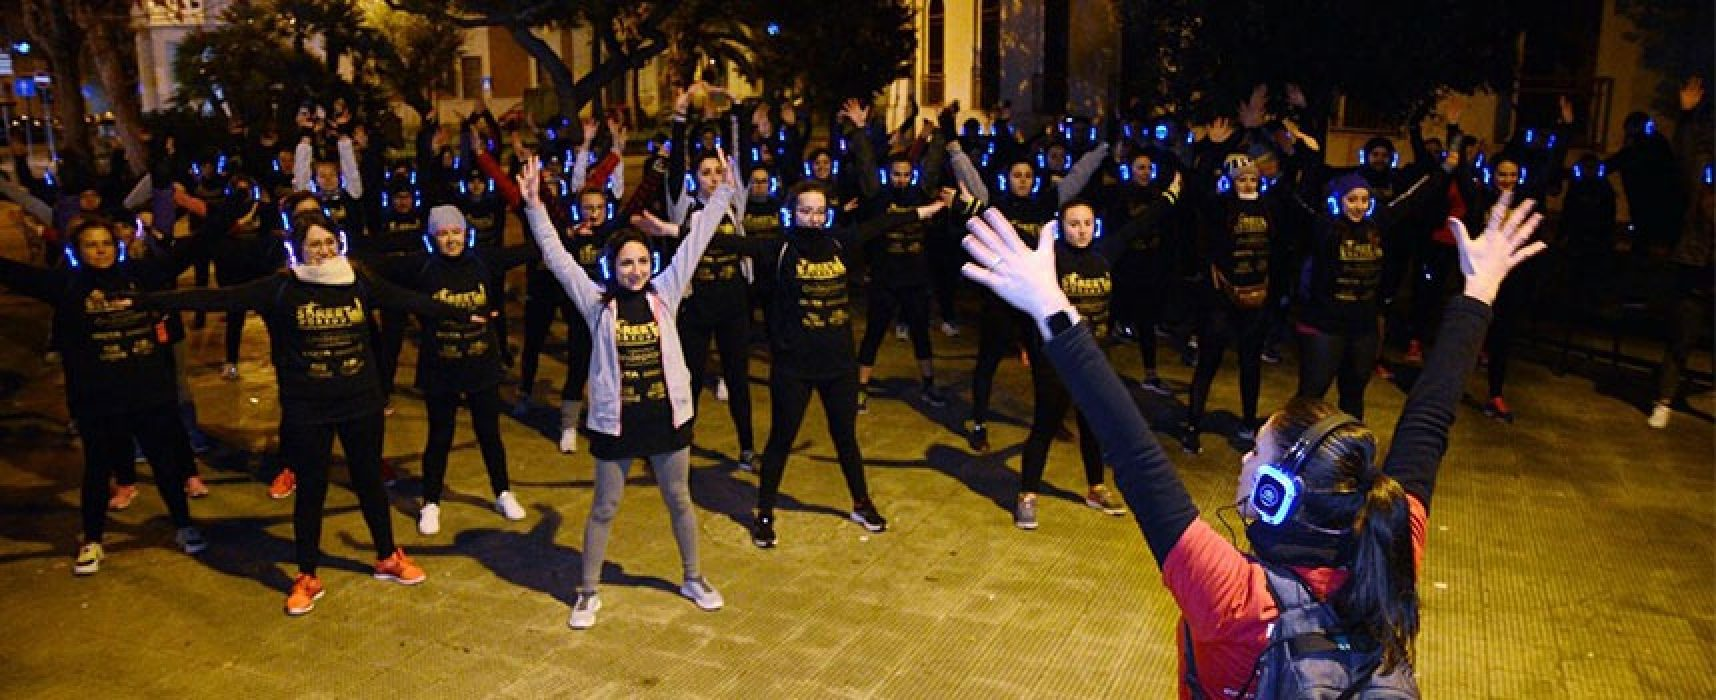 Street Workout, l'evento che unisce sport e cultura approda a Bisceglie